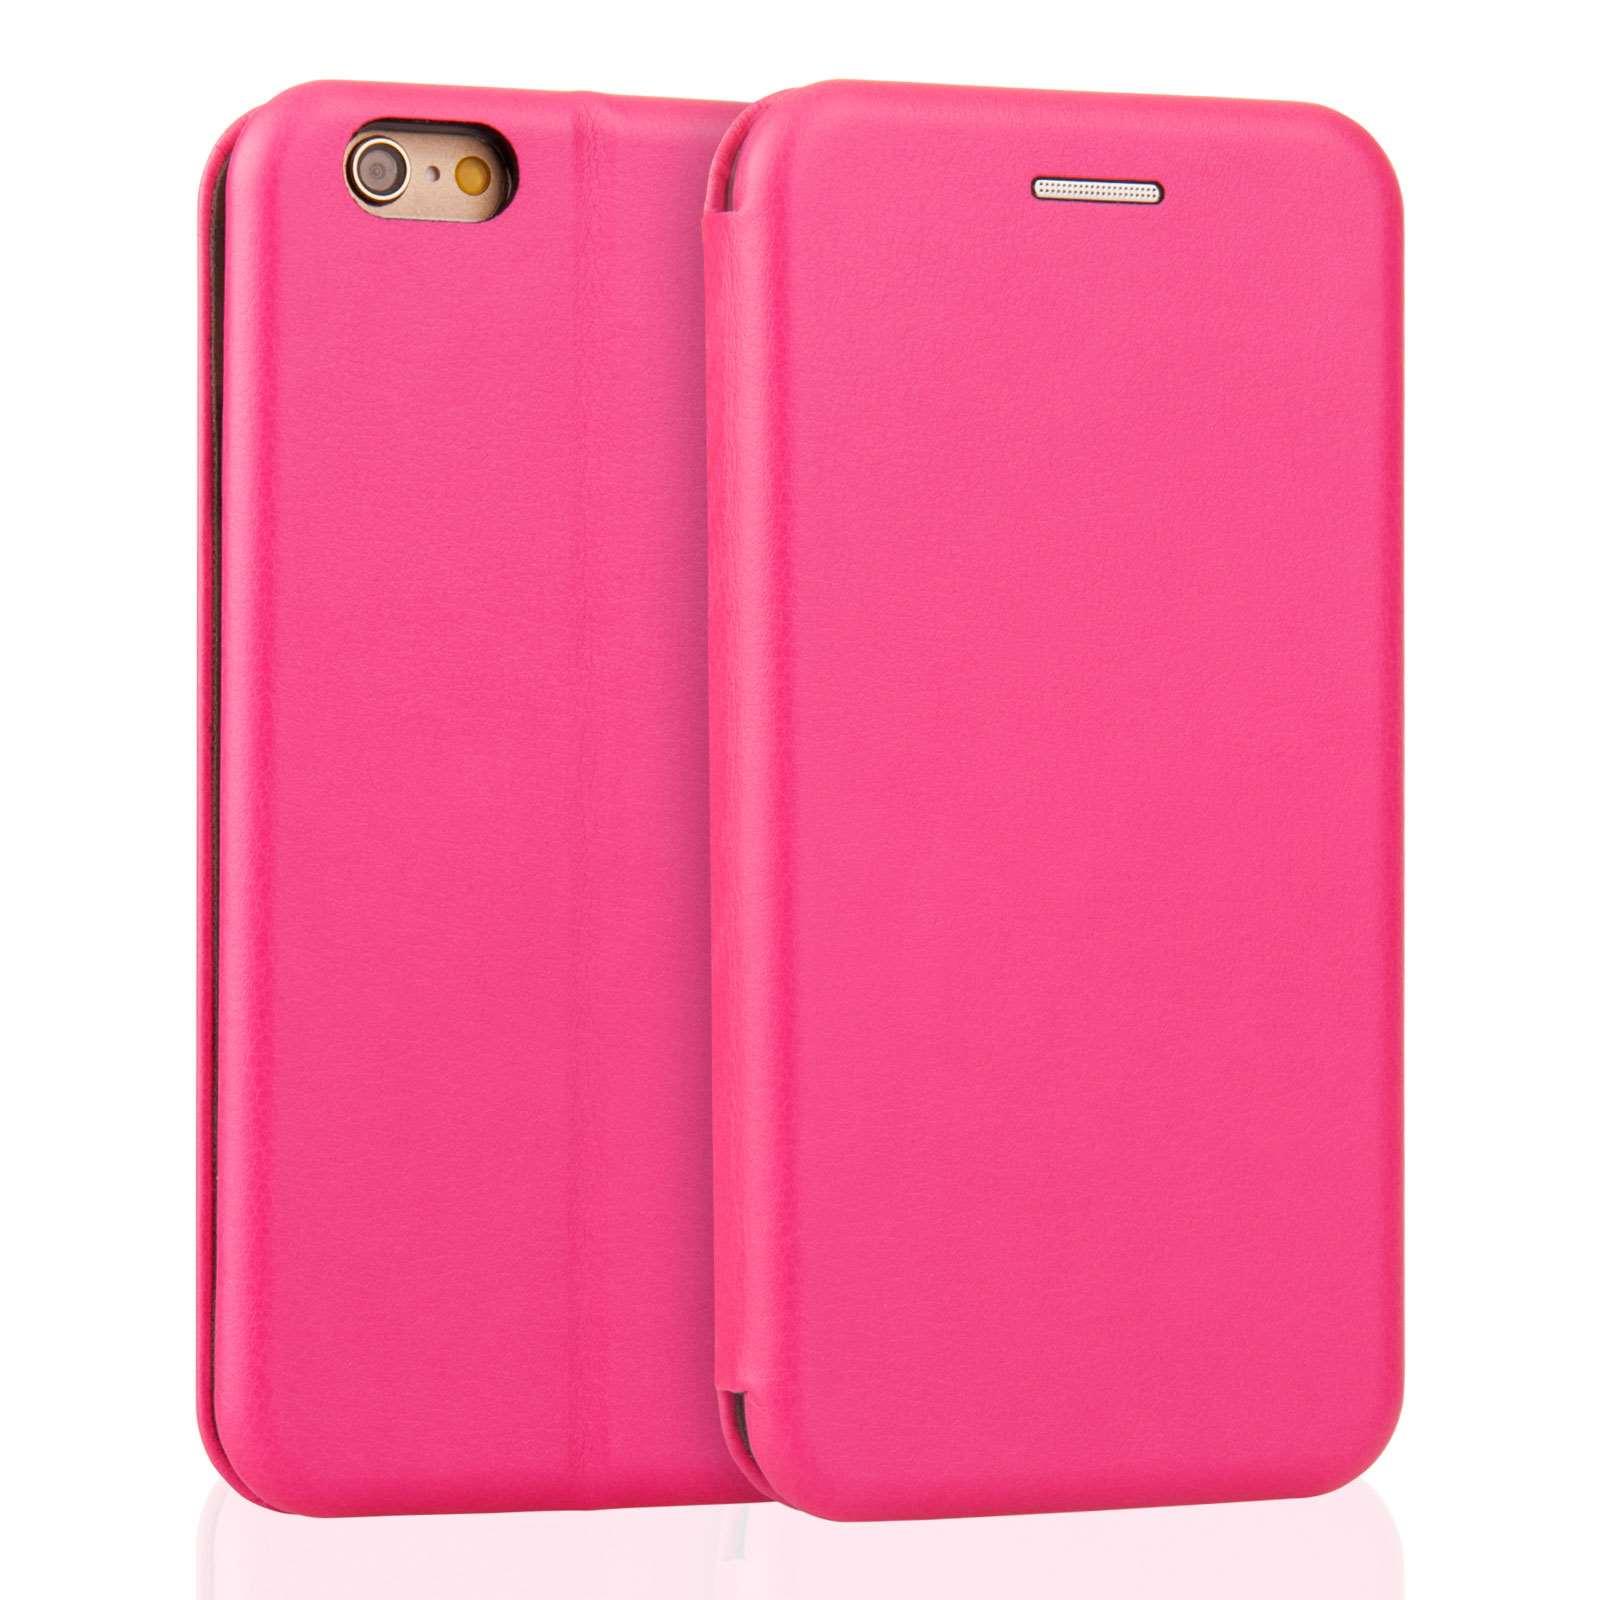 Caseflex Θήκη - Πορτοφόλι iPhone 6S / 6 - Pink (AP-GA03-Z449)